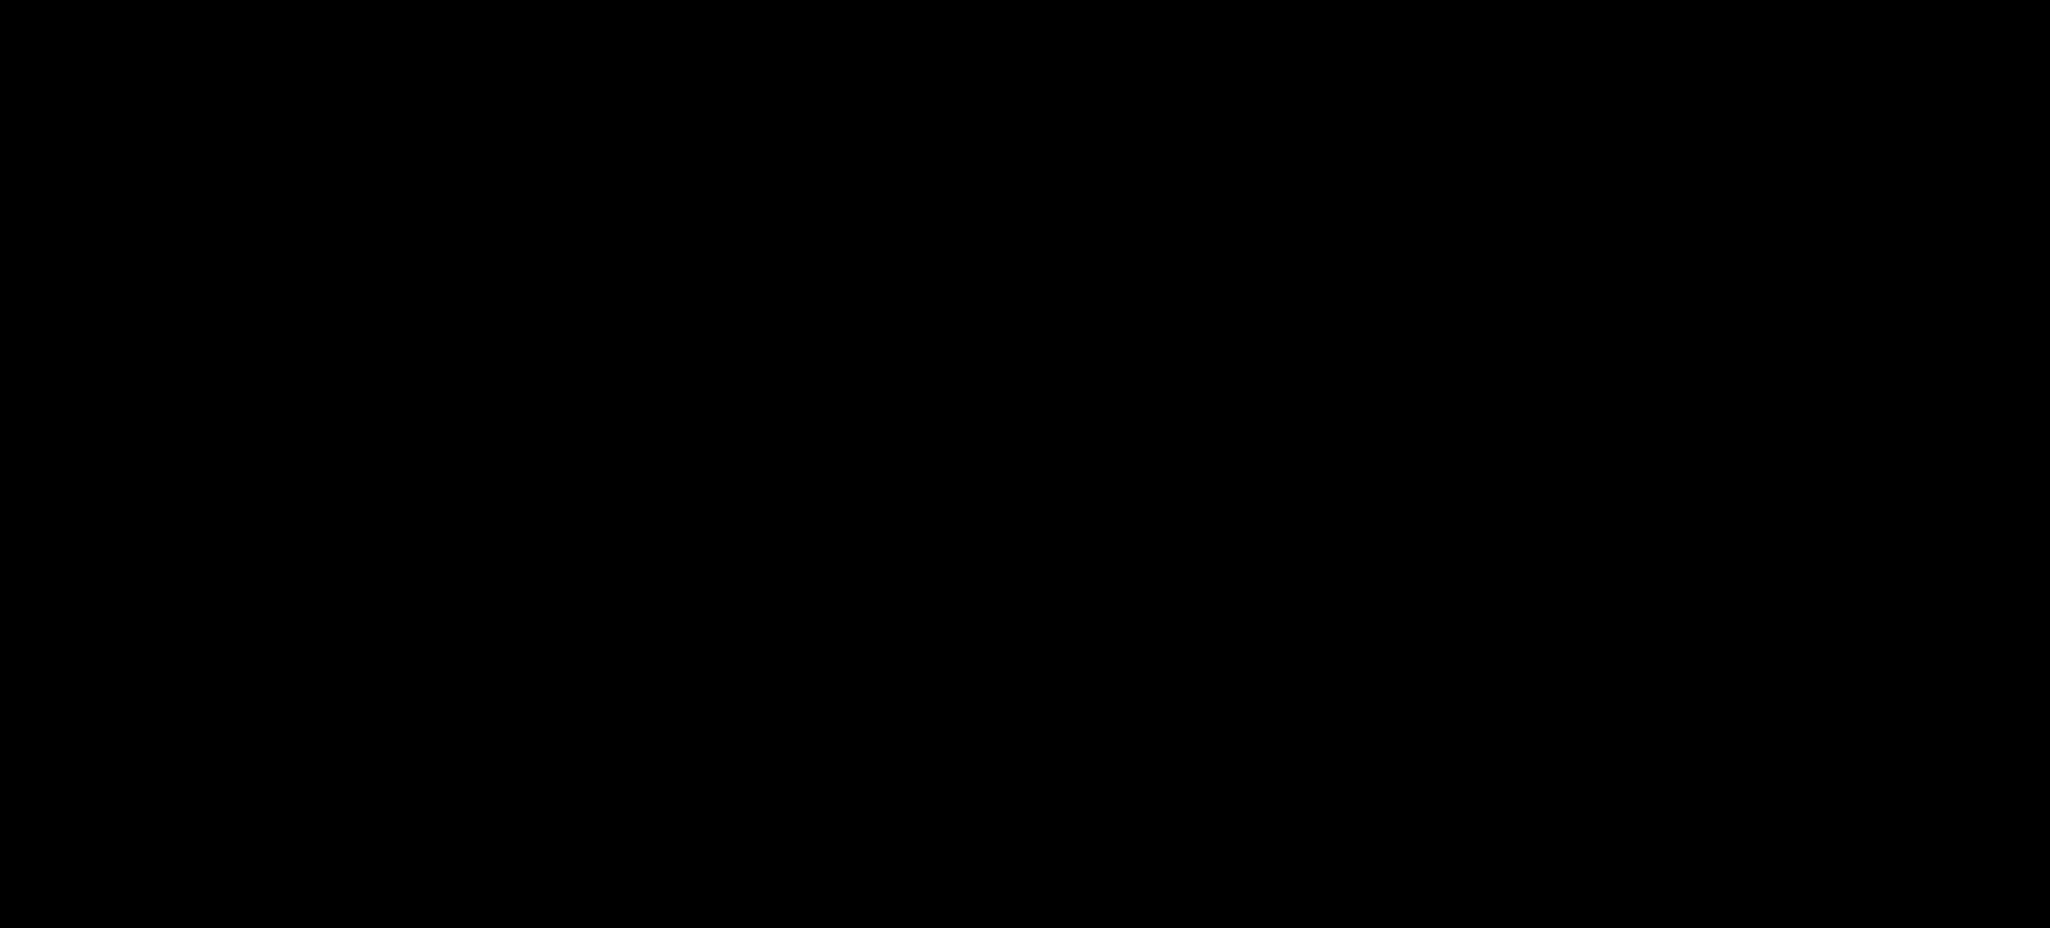 KRN 633